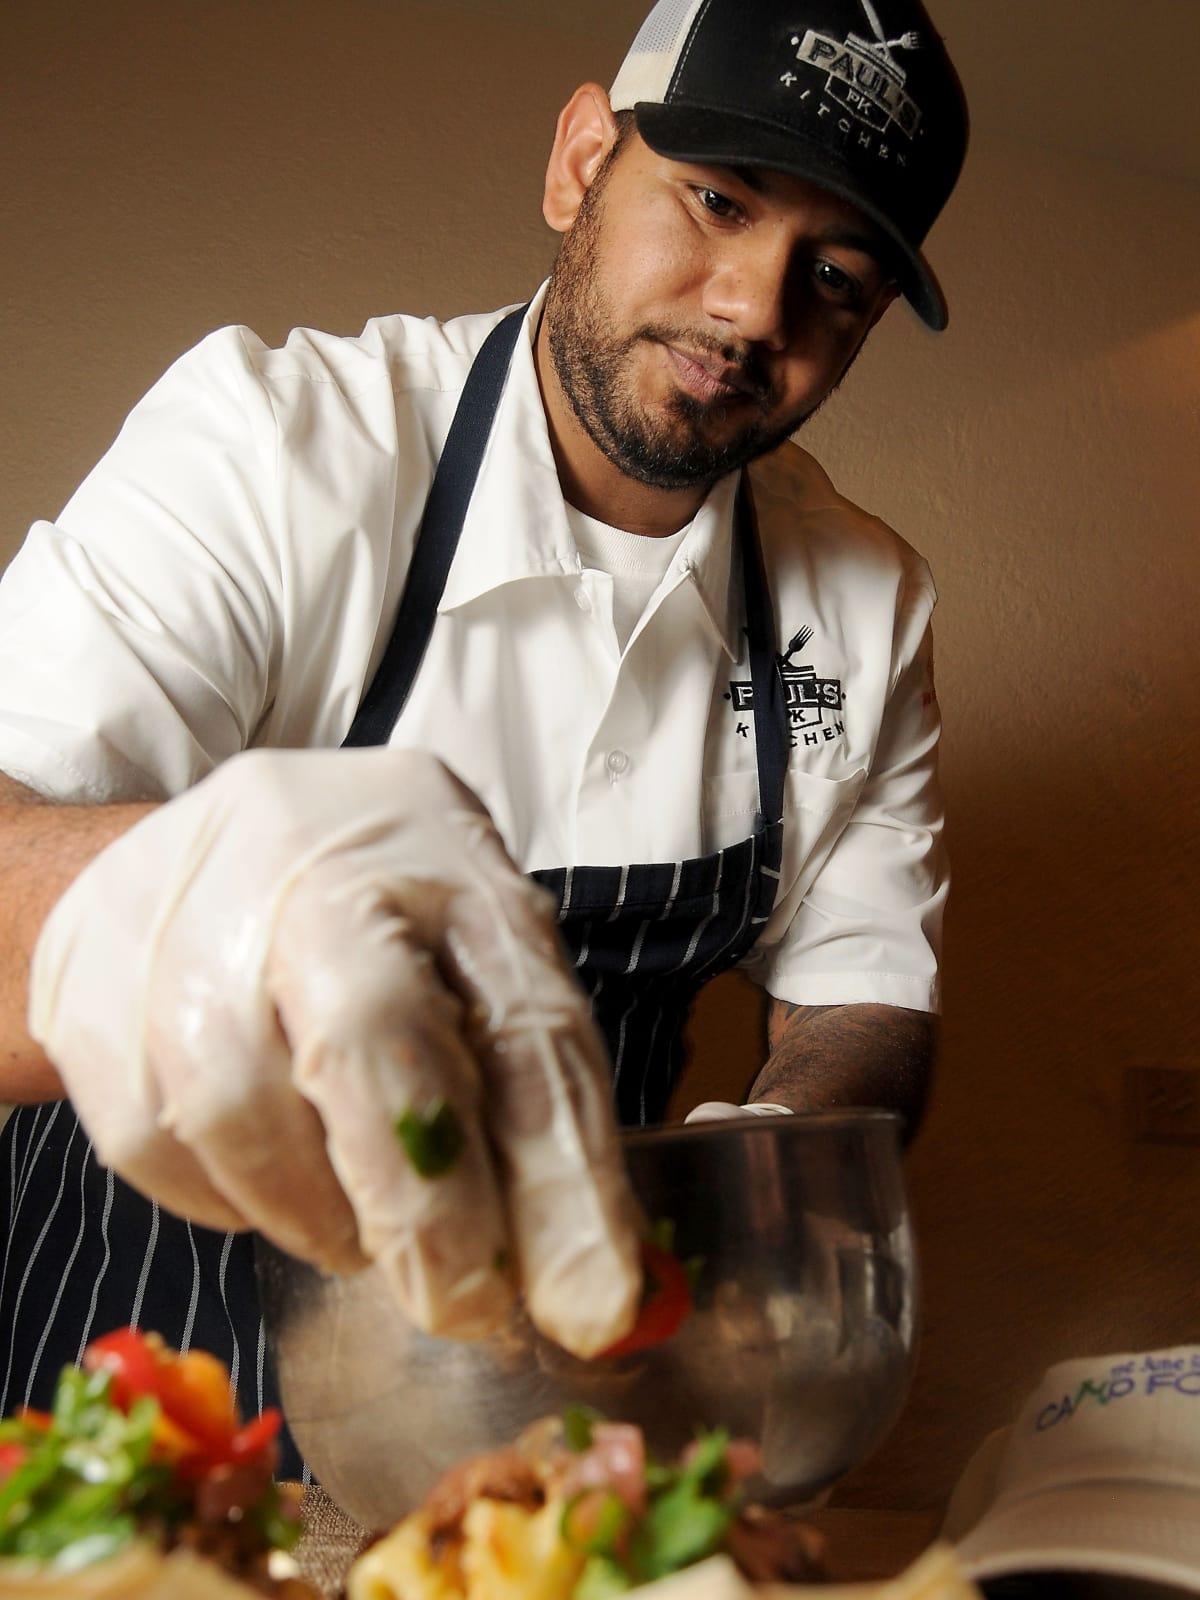 News, Shelby, Camp for All Camp Culinary, Sept. 2015, Cesar Munoz